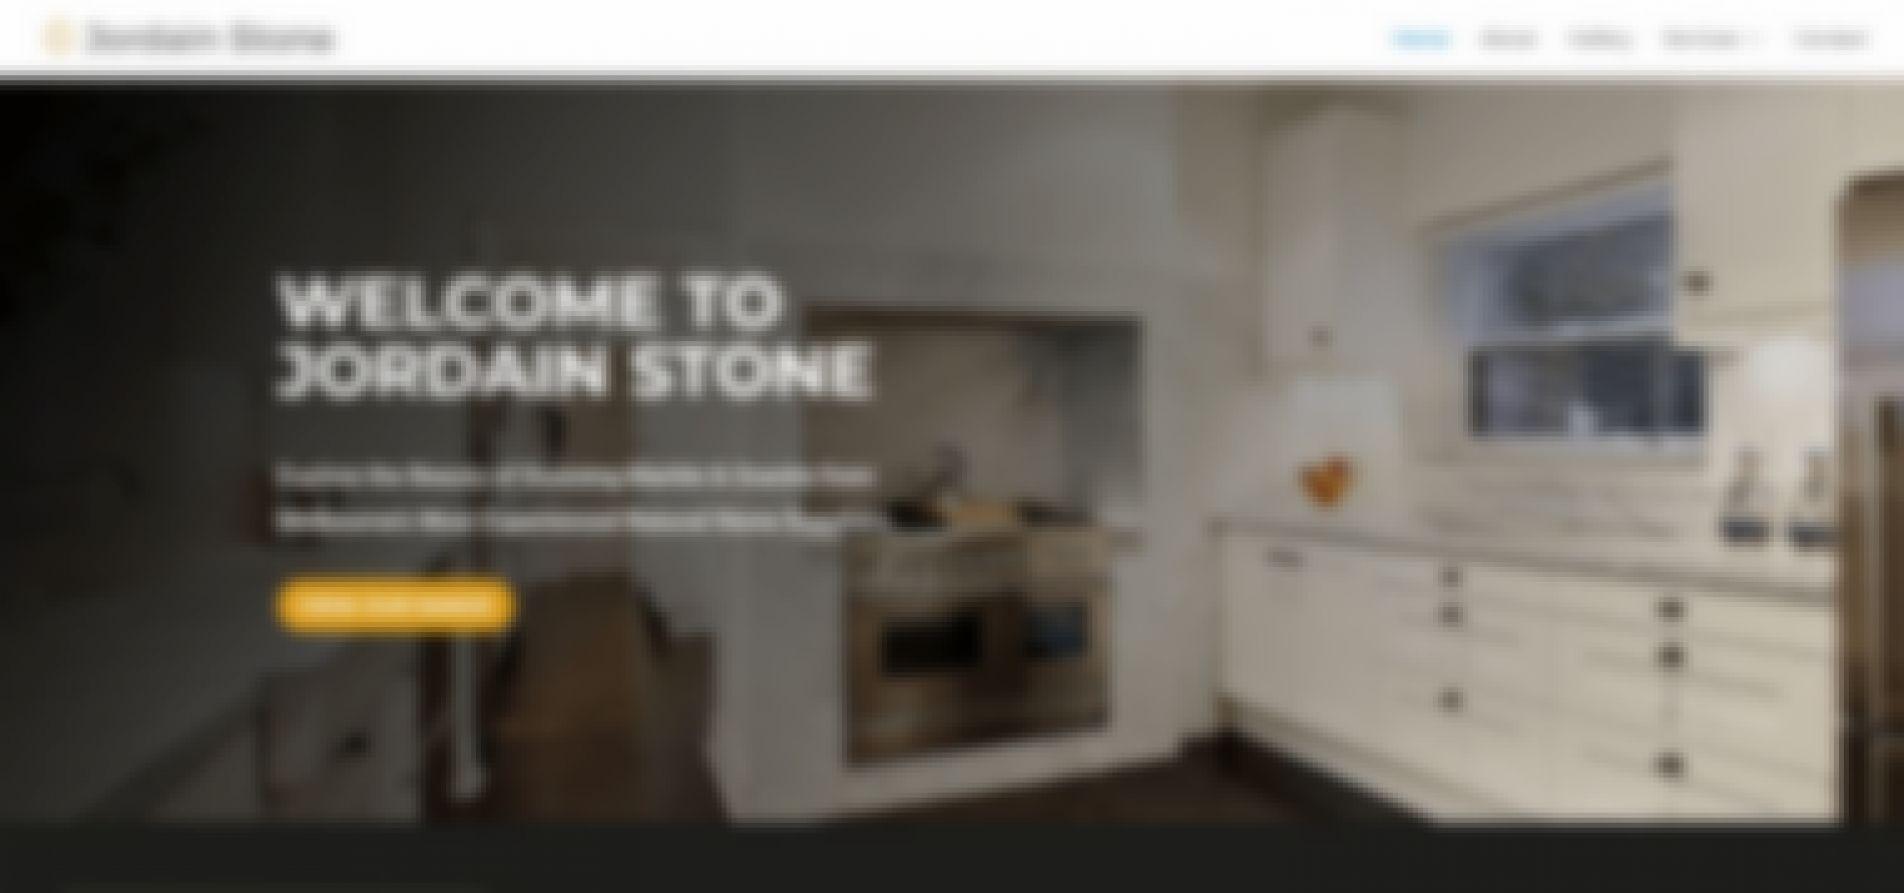 jordain stone